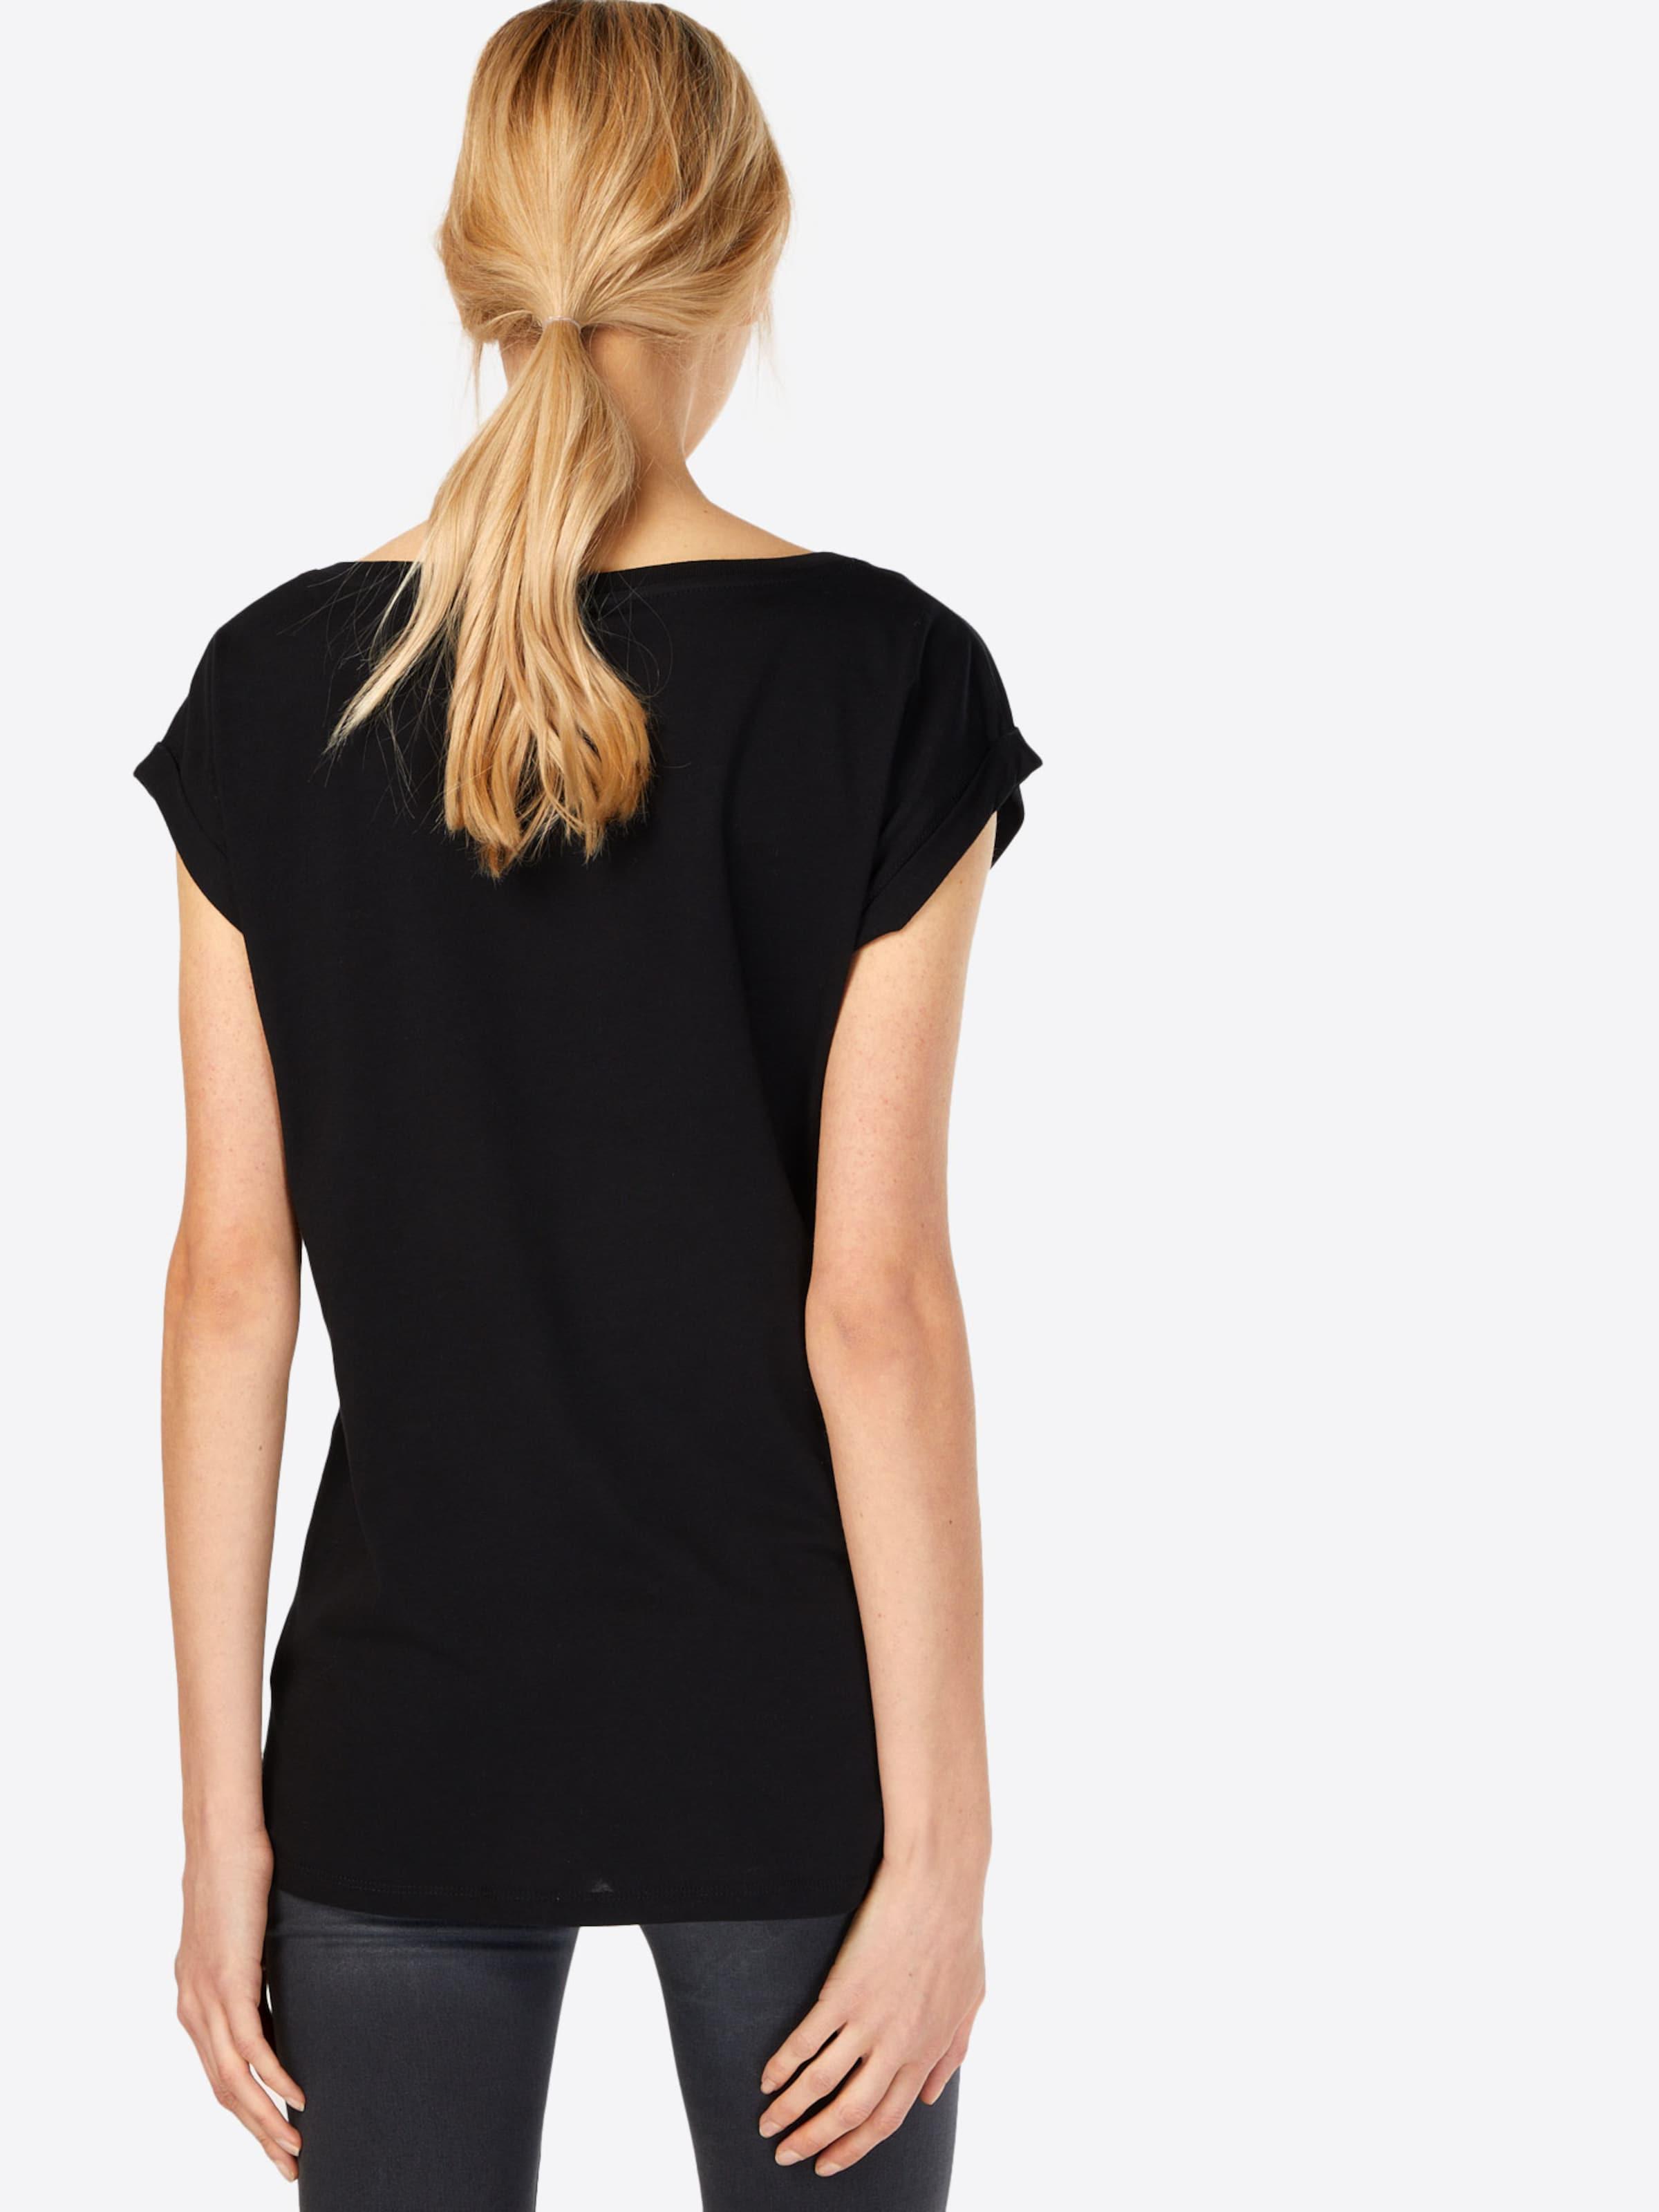 T Iriedaily shirt Noir 'taggety' En N8nwOX0Pk